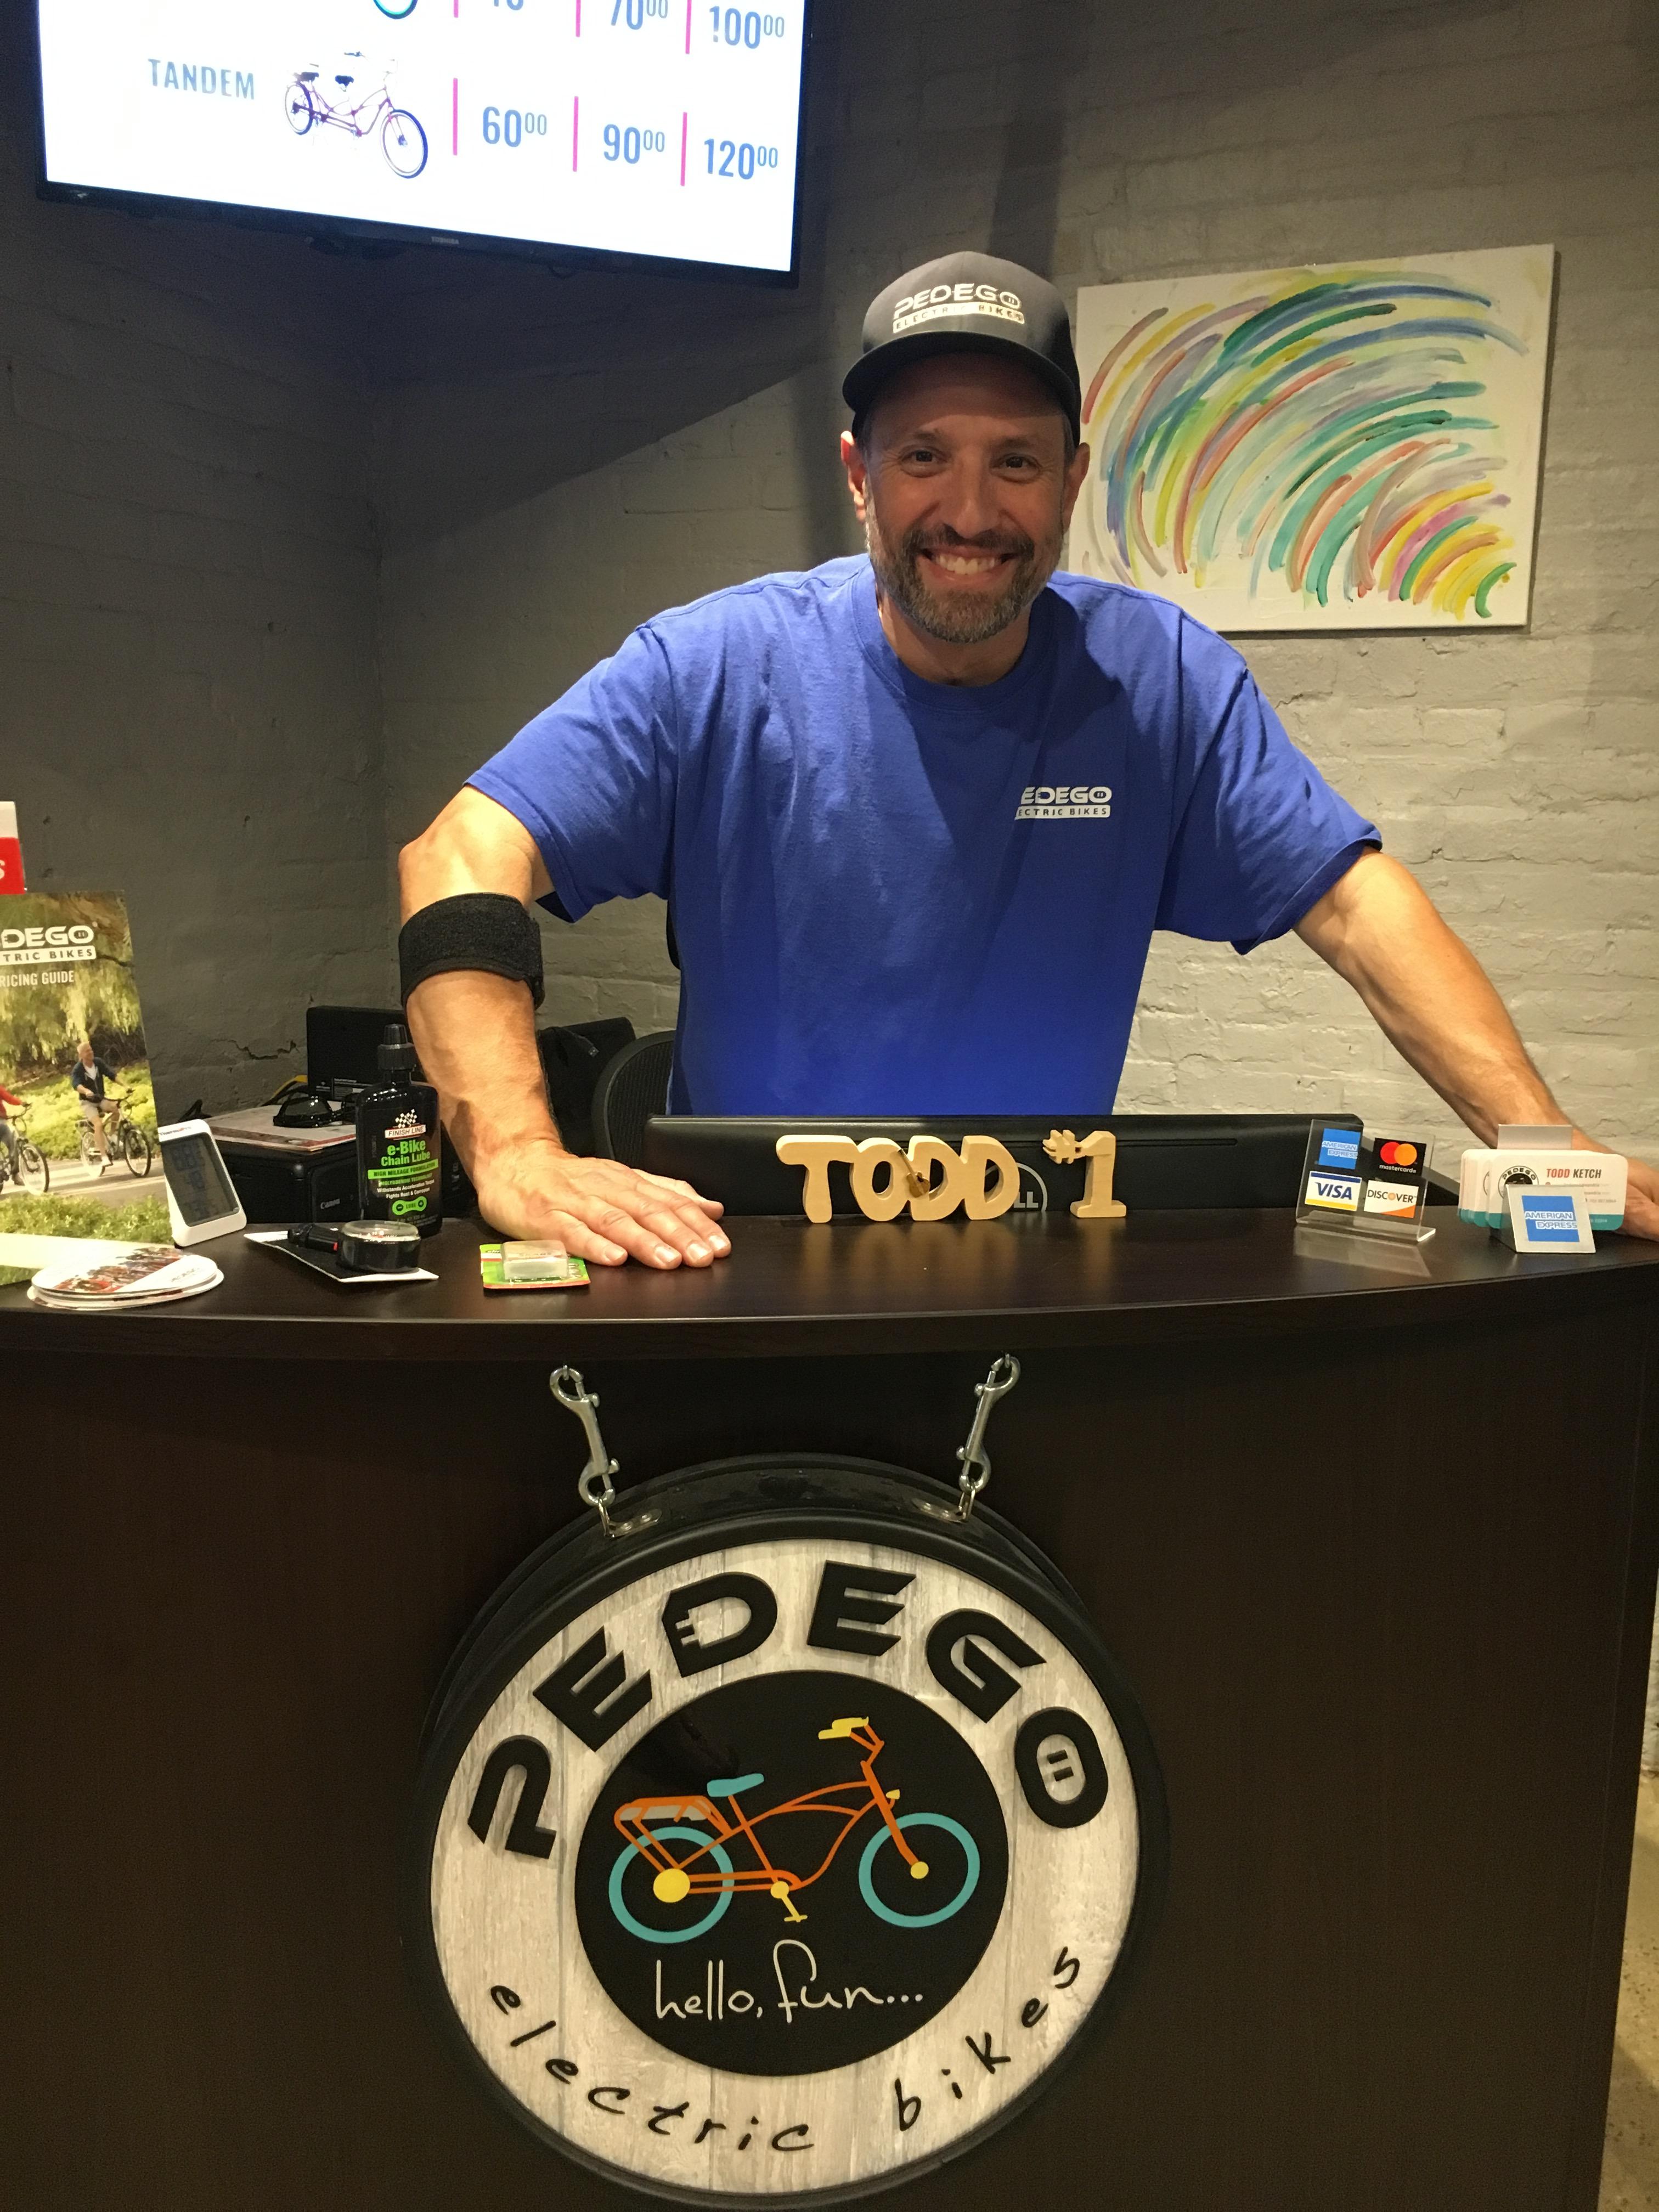 Pedego Electric Bikes are on the Run!